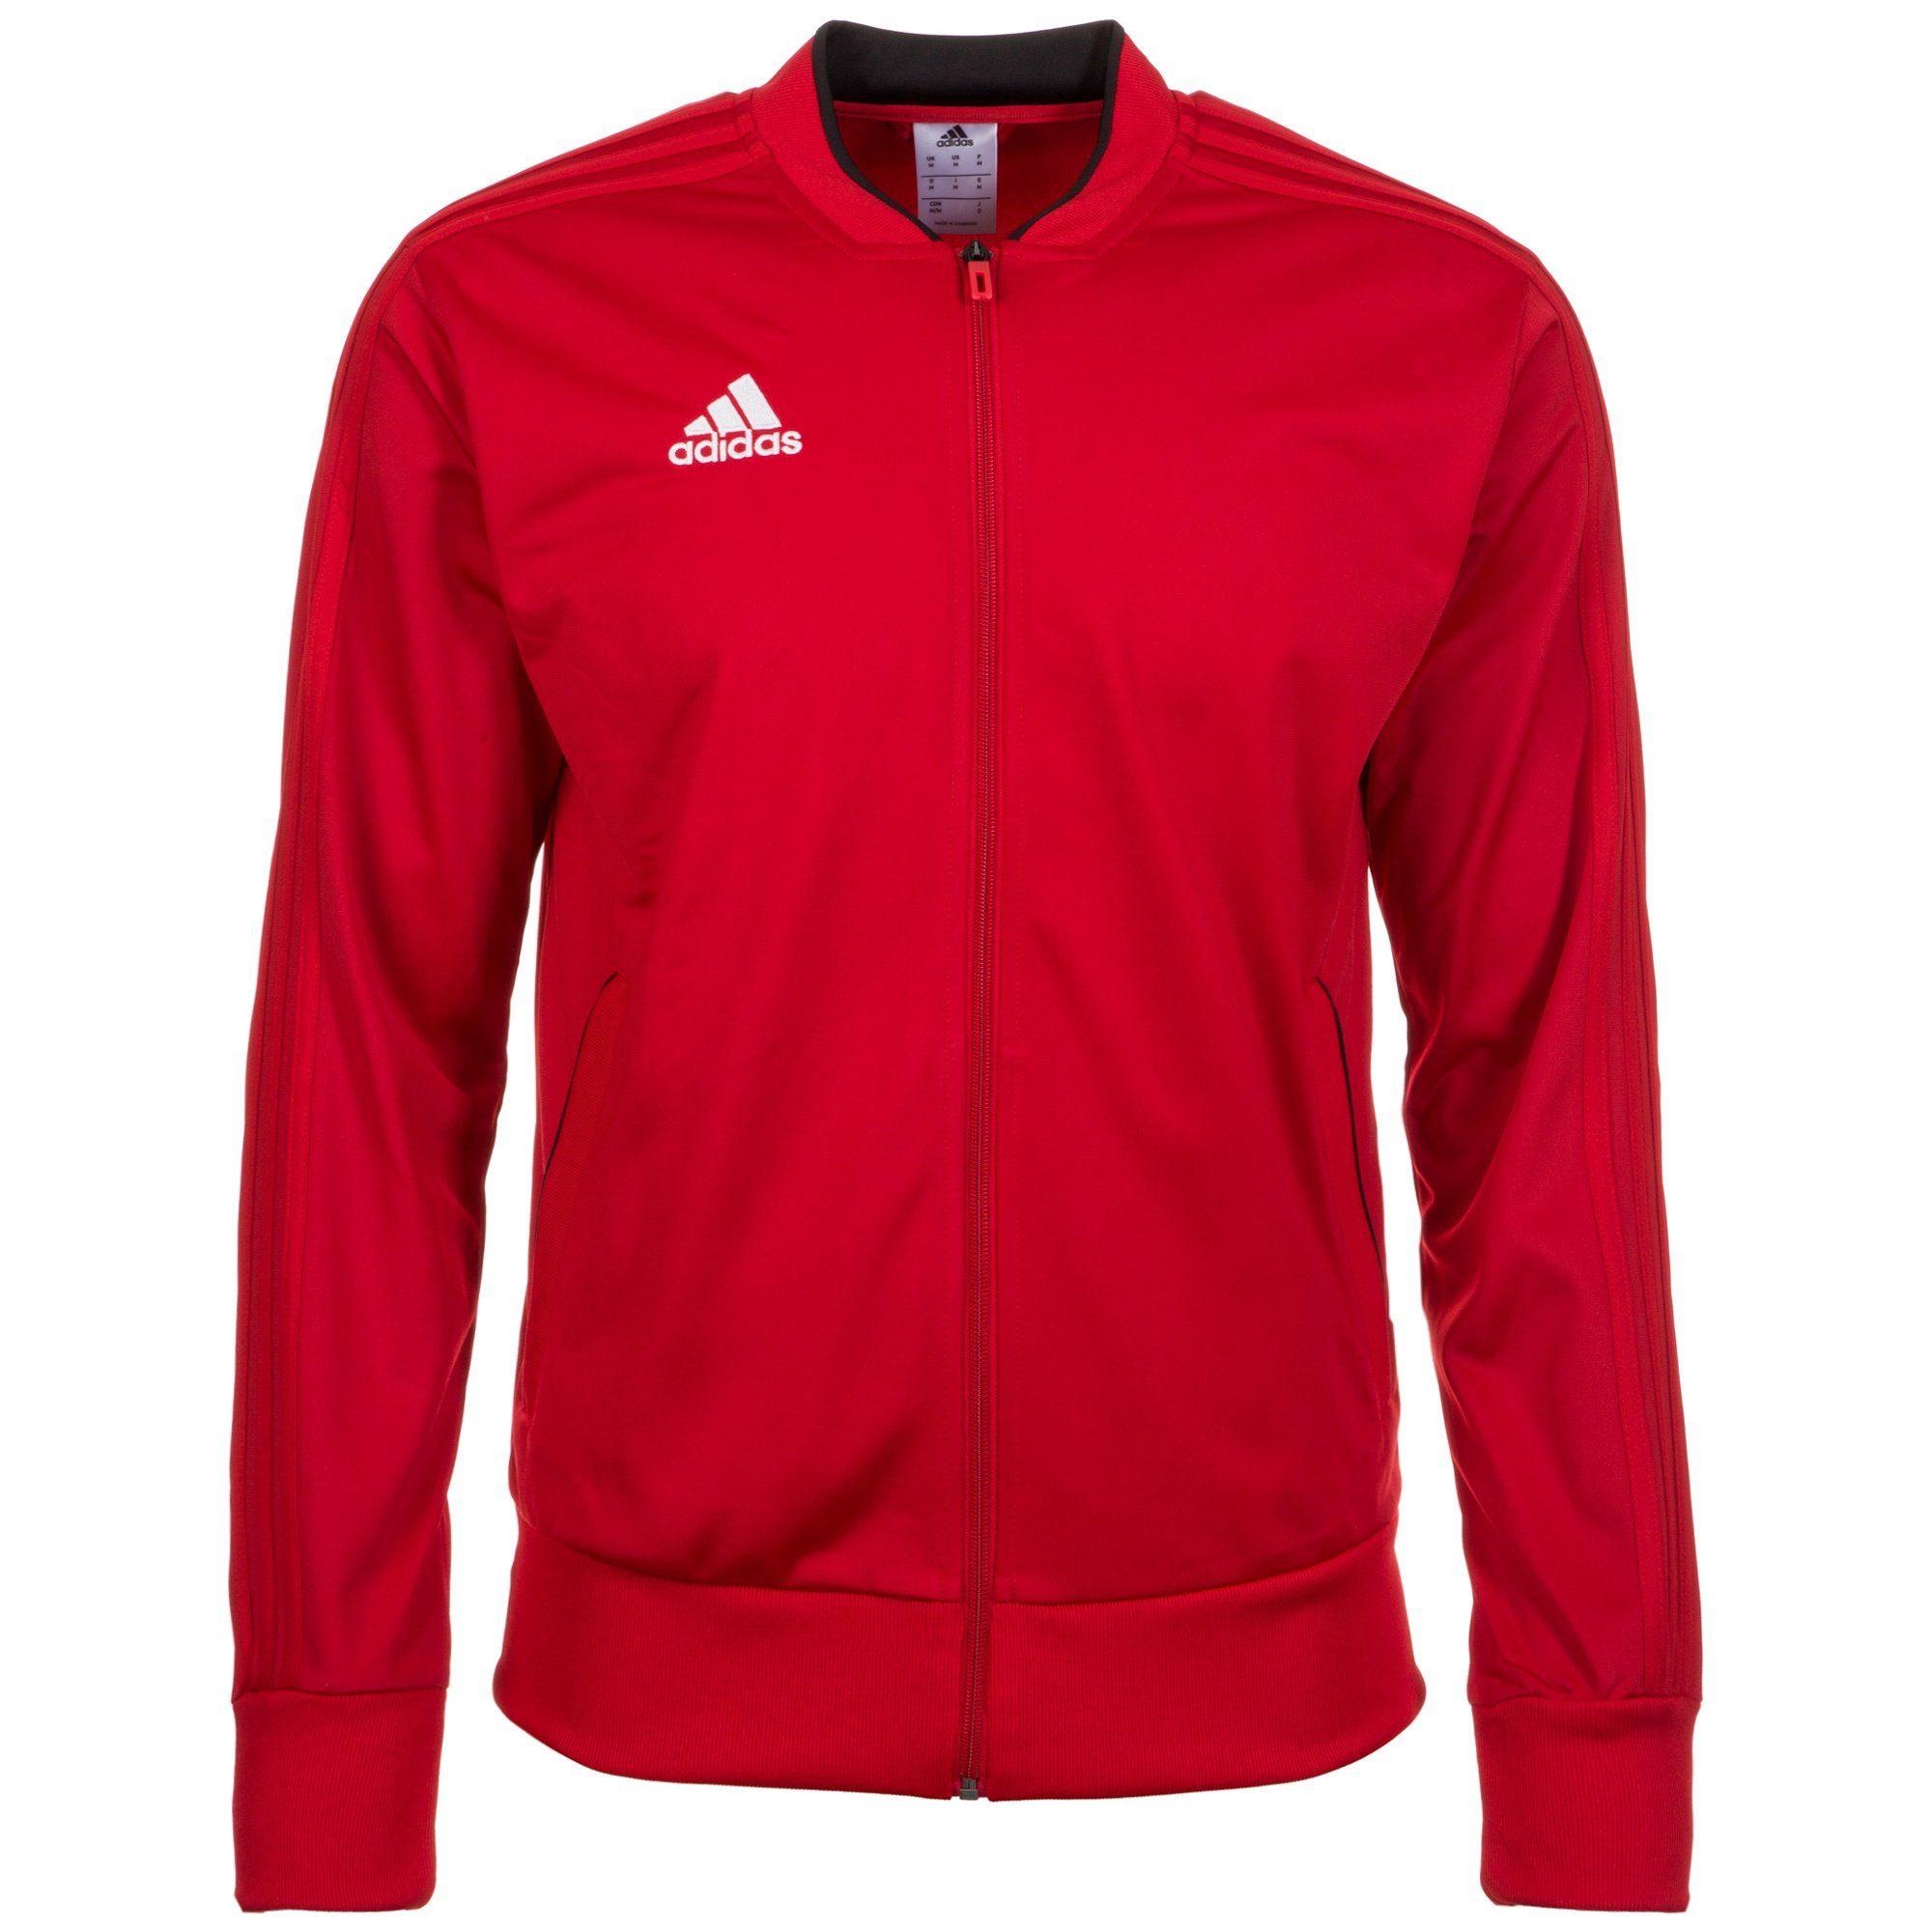 adidas Performance Trainingsjacke Condivo 18   Sportbekleidung > Sportjacken > Trainingsjacken   Rot   Adidas Performance